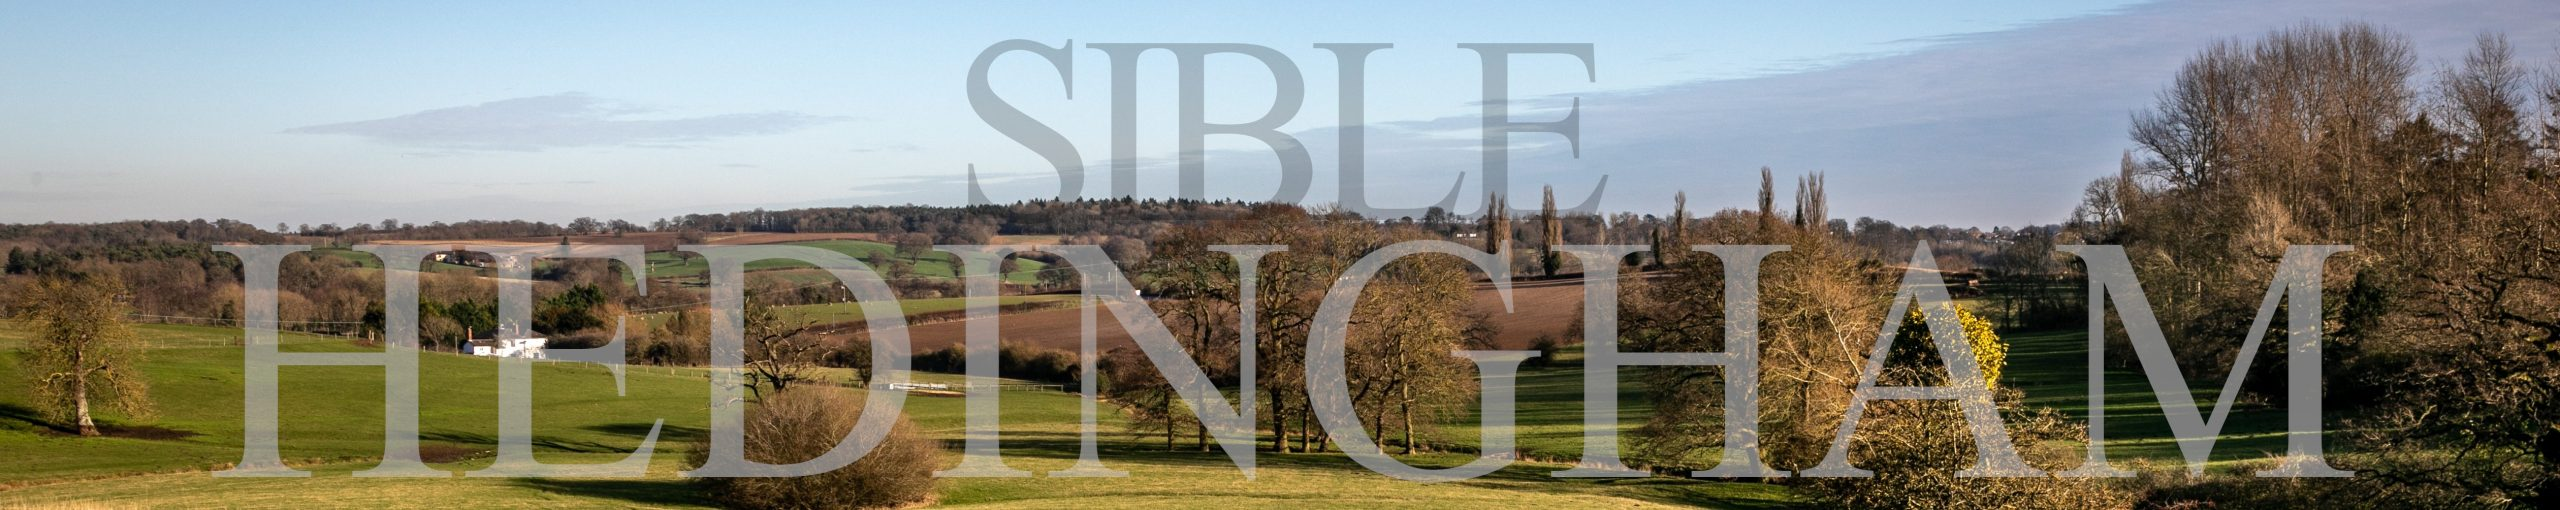 Sible Hedingham Parish Council